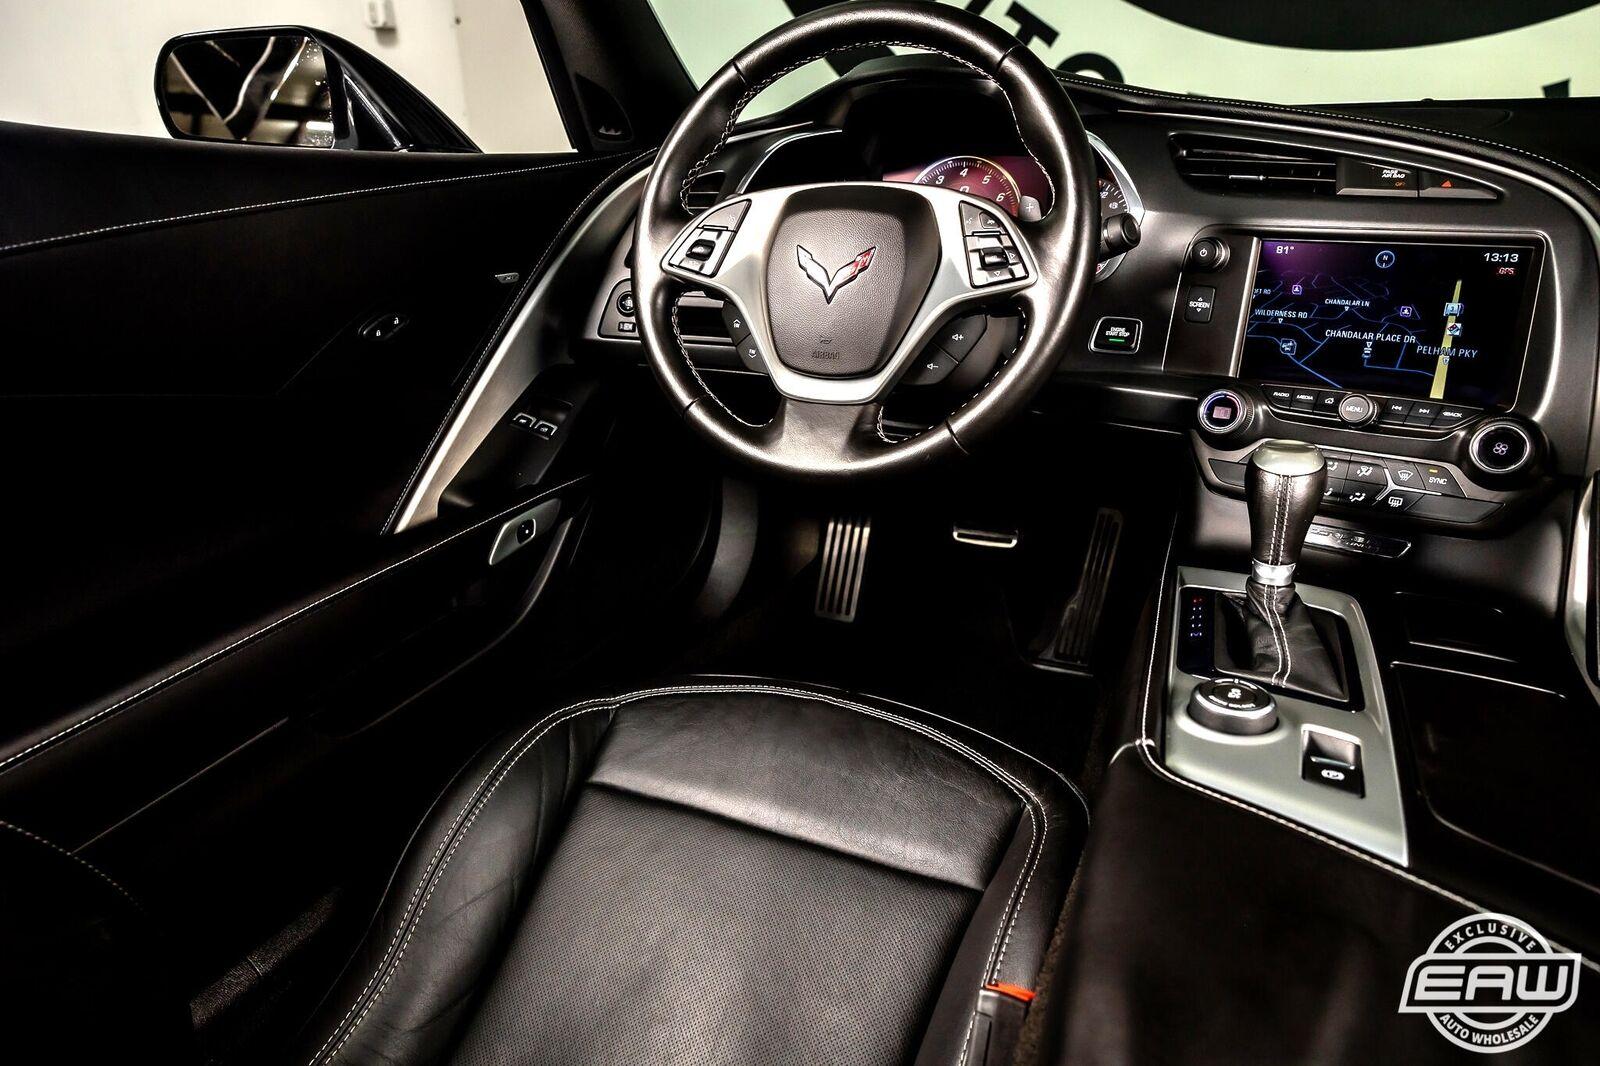 2014 White Chevrolet Corvette Coupe 1LT   C7 Corvette Photo 7